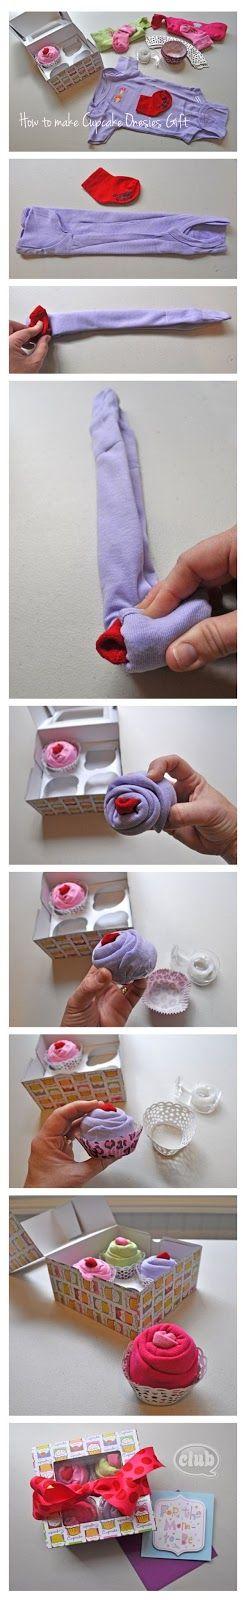 cupcake baby gift steps